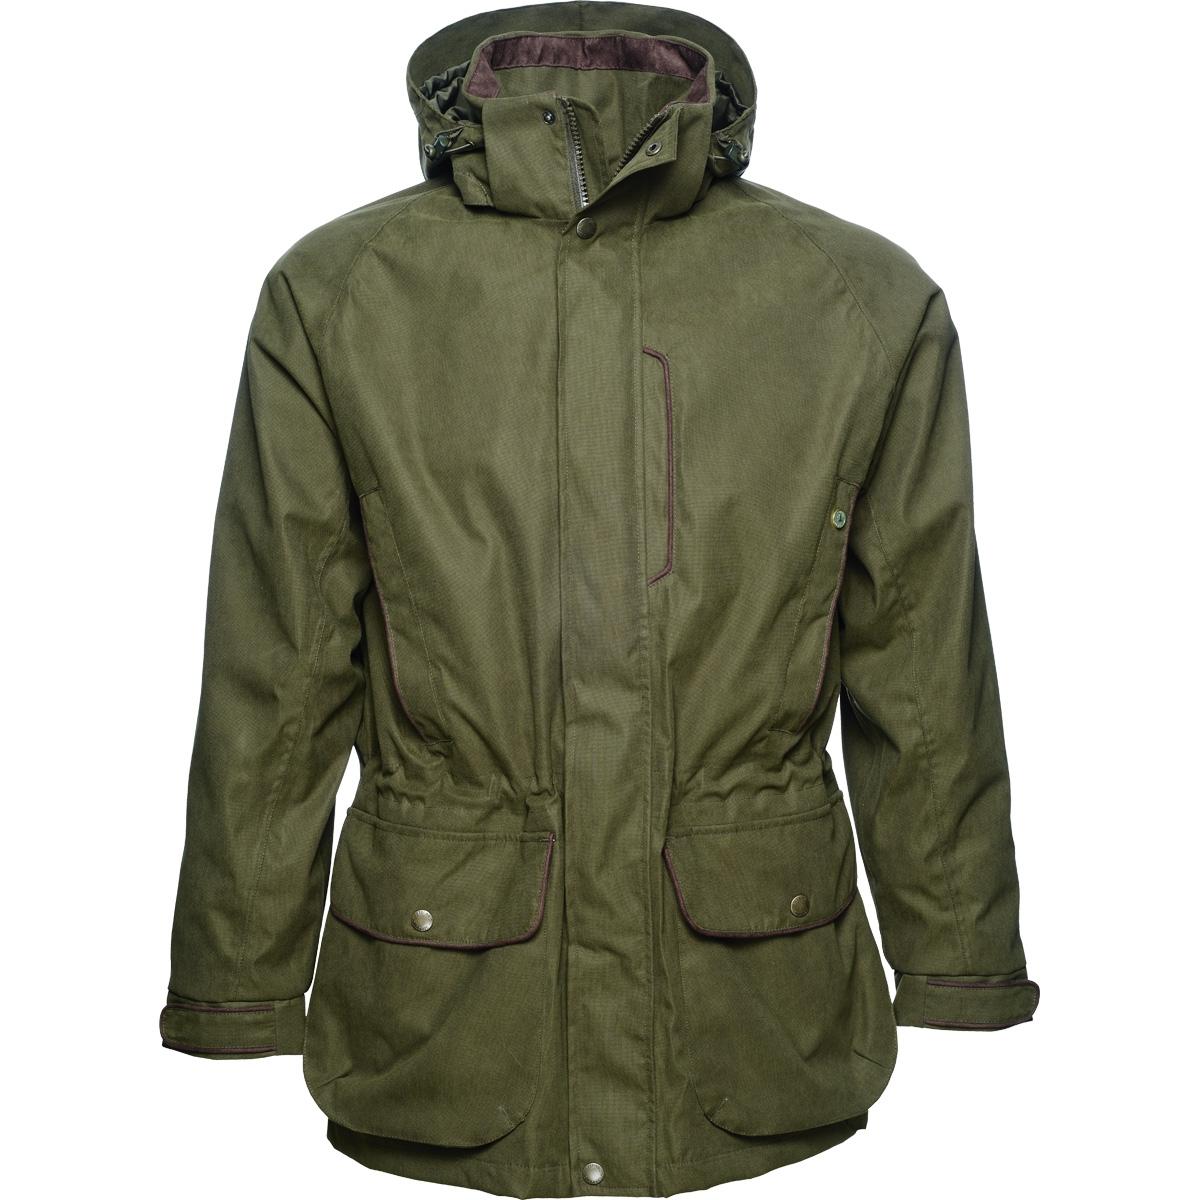 4d2a854e299c5 Seeland Woodcock II Ladies Waterproof Jacket – Melbourne Gun